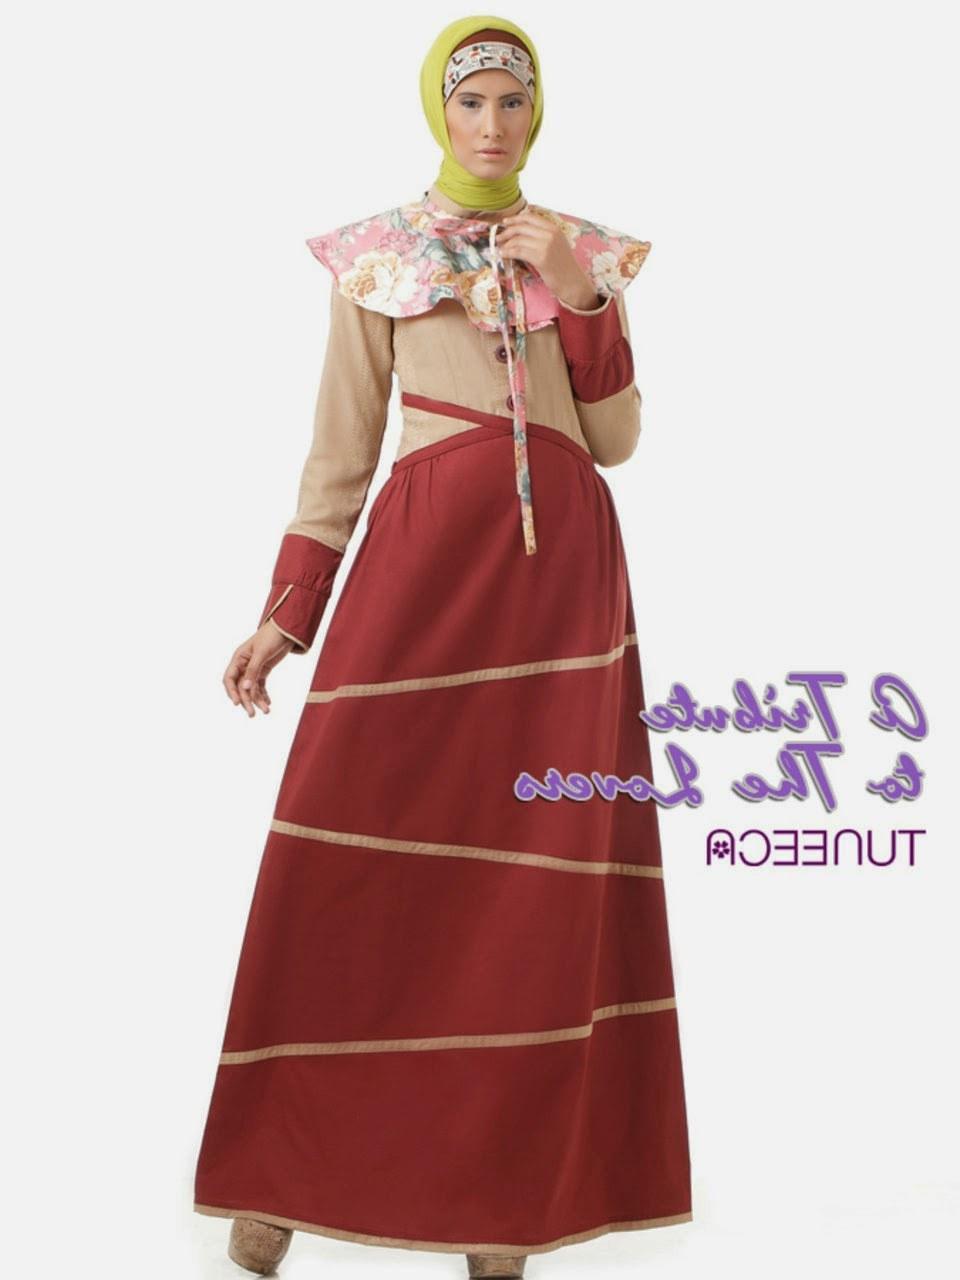 Bentuk Gambar Baju Lebaran Terbaru Ipdd 12 Contoh Model Gamis Muslim Lebaran Terbaru Kumpulan